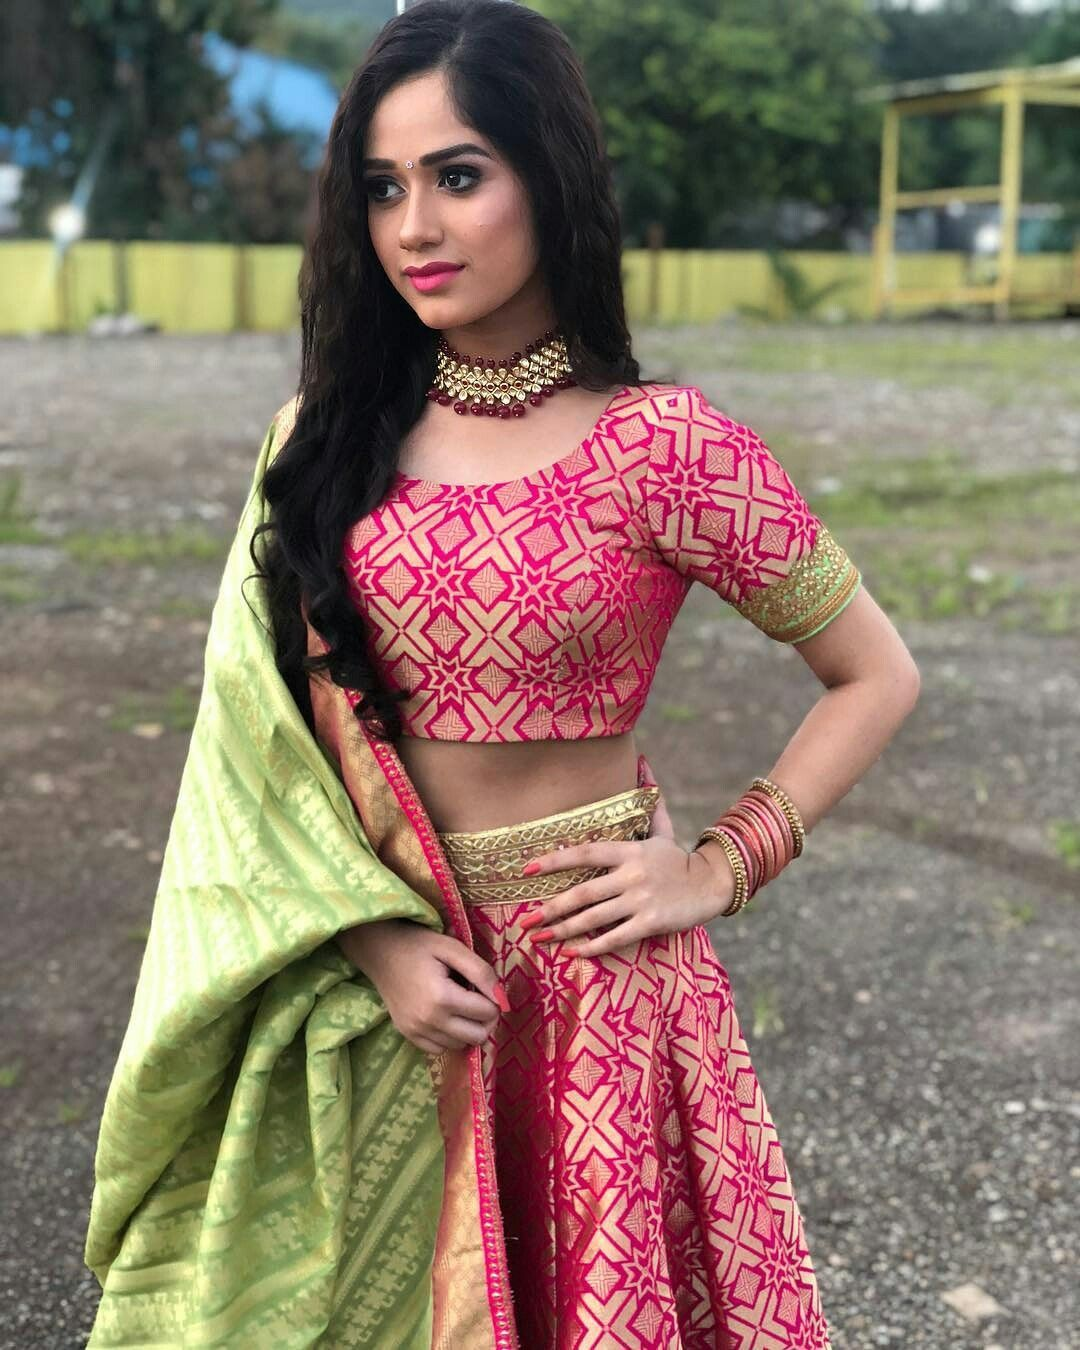 Jannat zubair pink dress  Pin by Juwariyah Nafees on Jannat Zubair Rahmani in   Pinterest